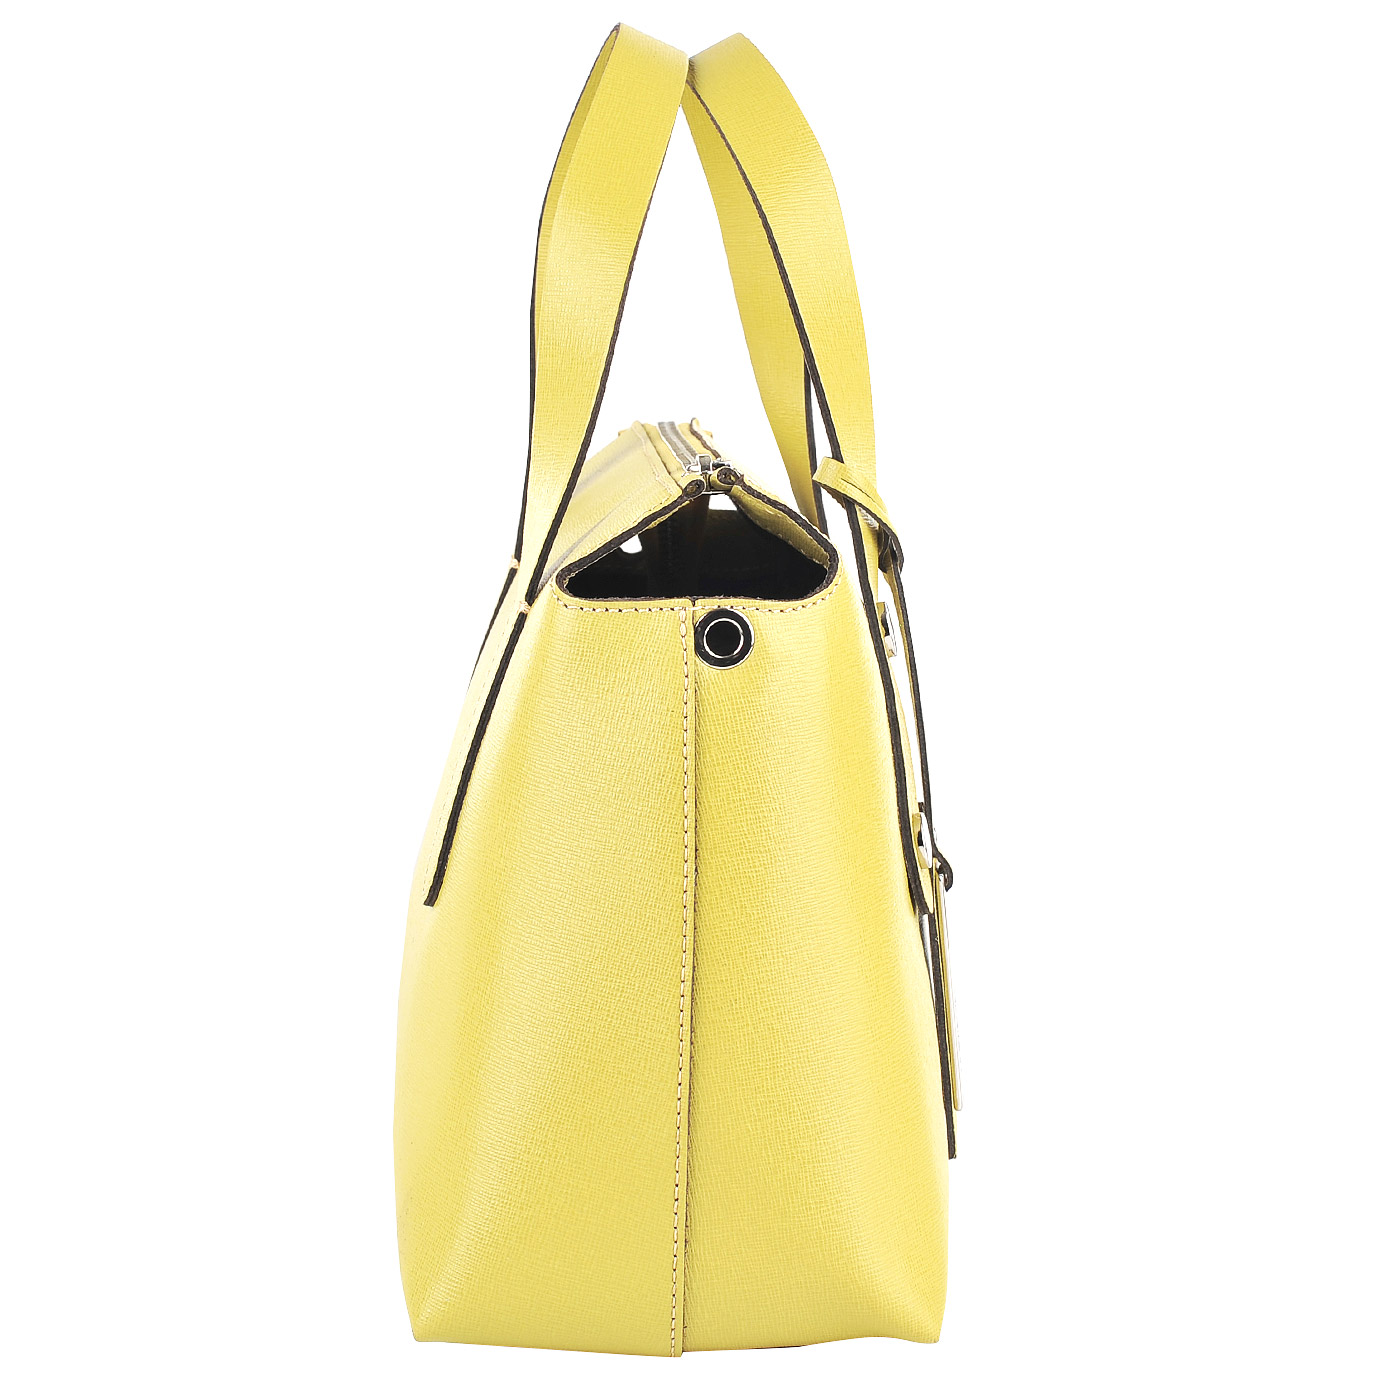 22b5cffa1a22 Женская кожаная сумка Ripani Positano 7424JJ.00054 - 2000557670518 ...